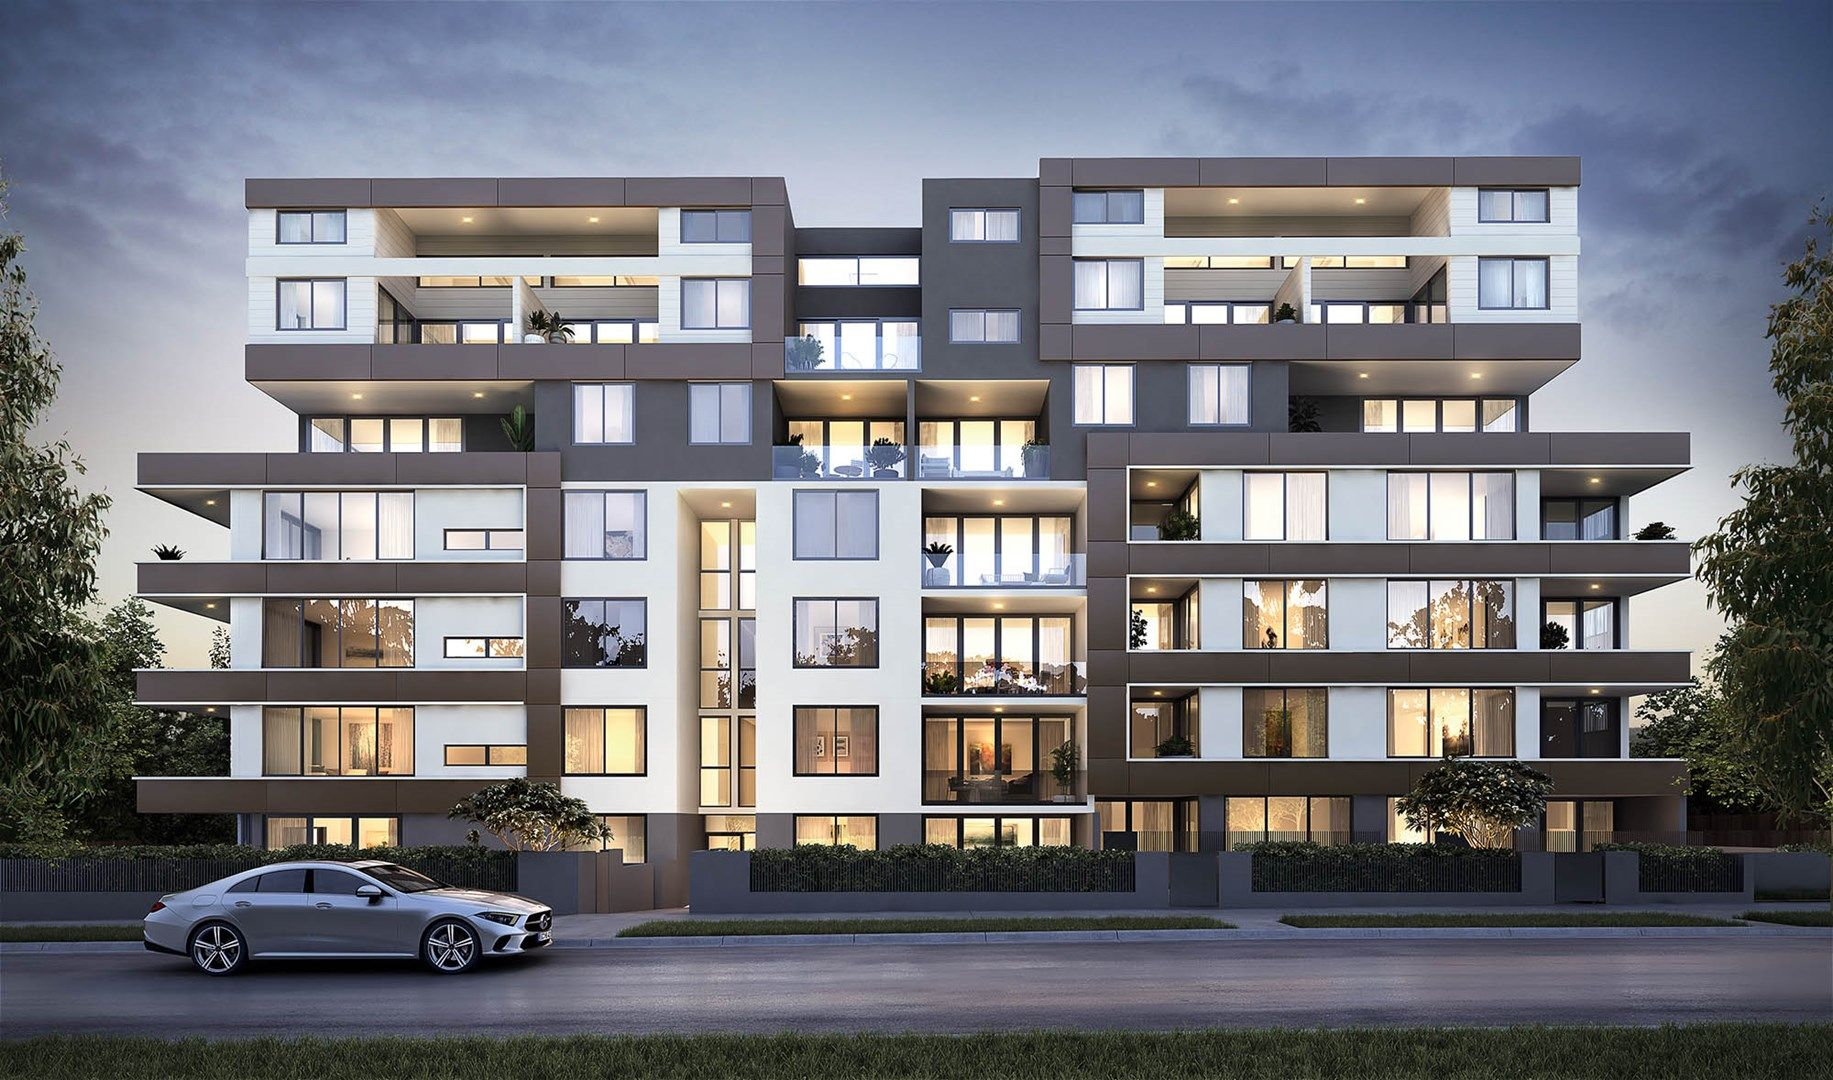 Lot 14 10-14 Carinya Street, Blacktown NSW 2148, Image 0